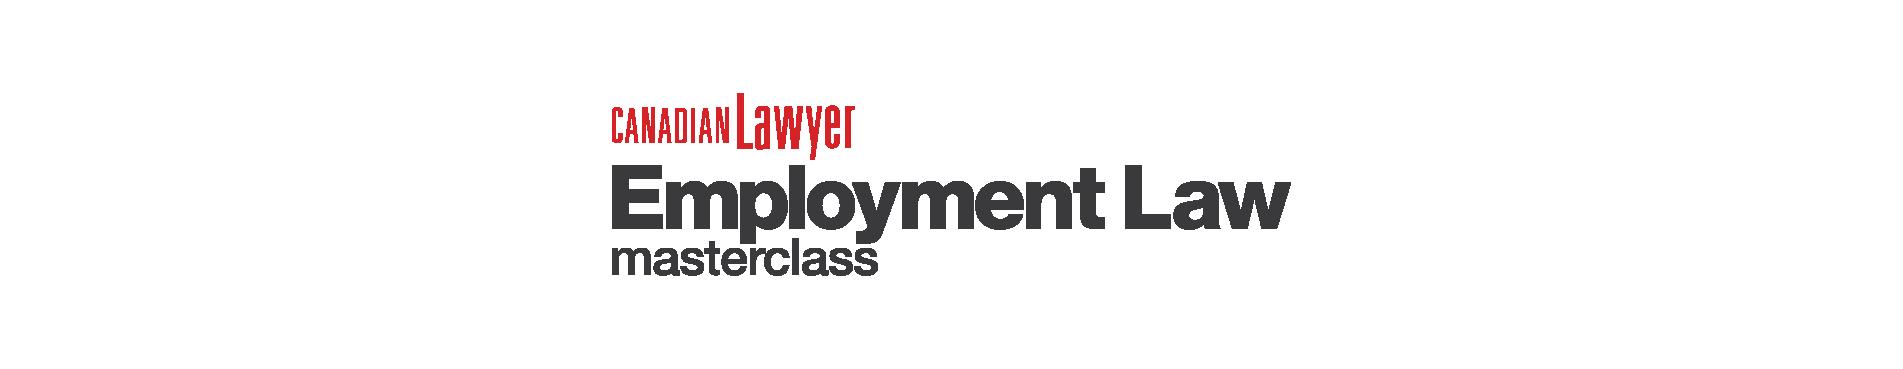 Employment Law Masterclass